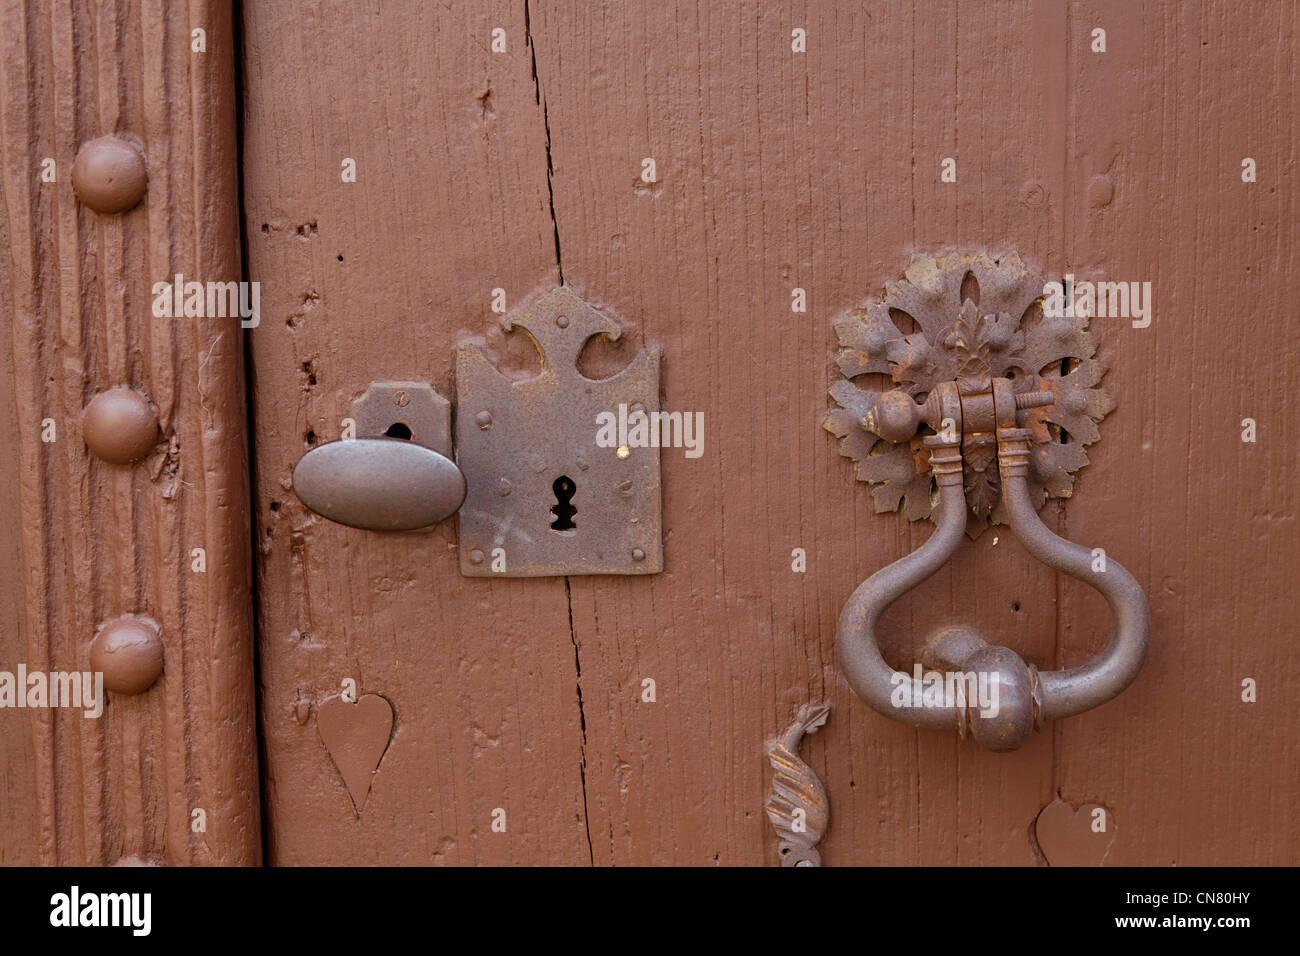 France, Puy de Dome, Vic le Comte, old door - Stock Image